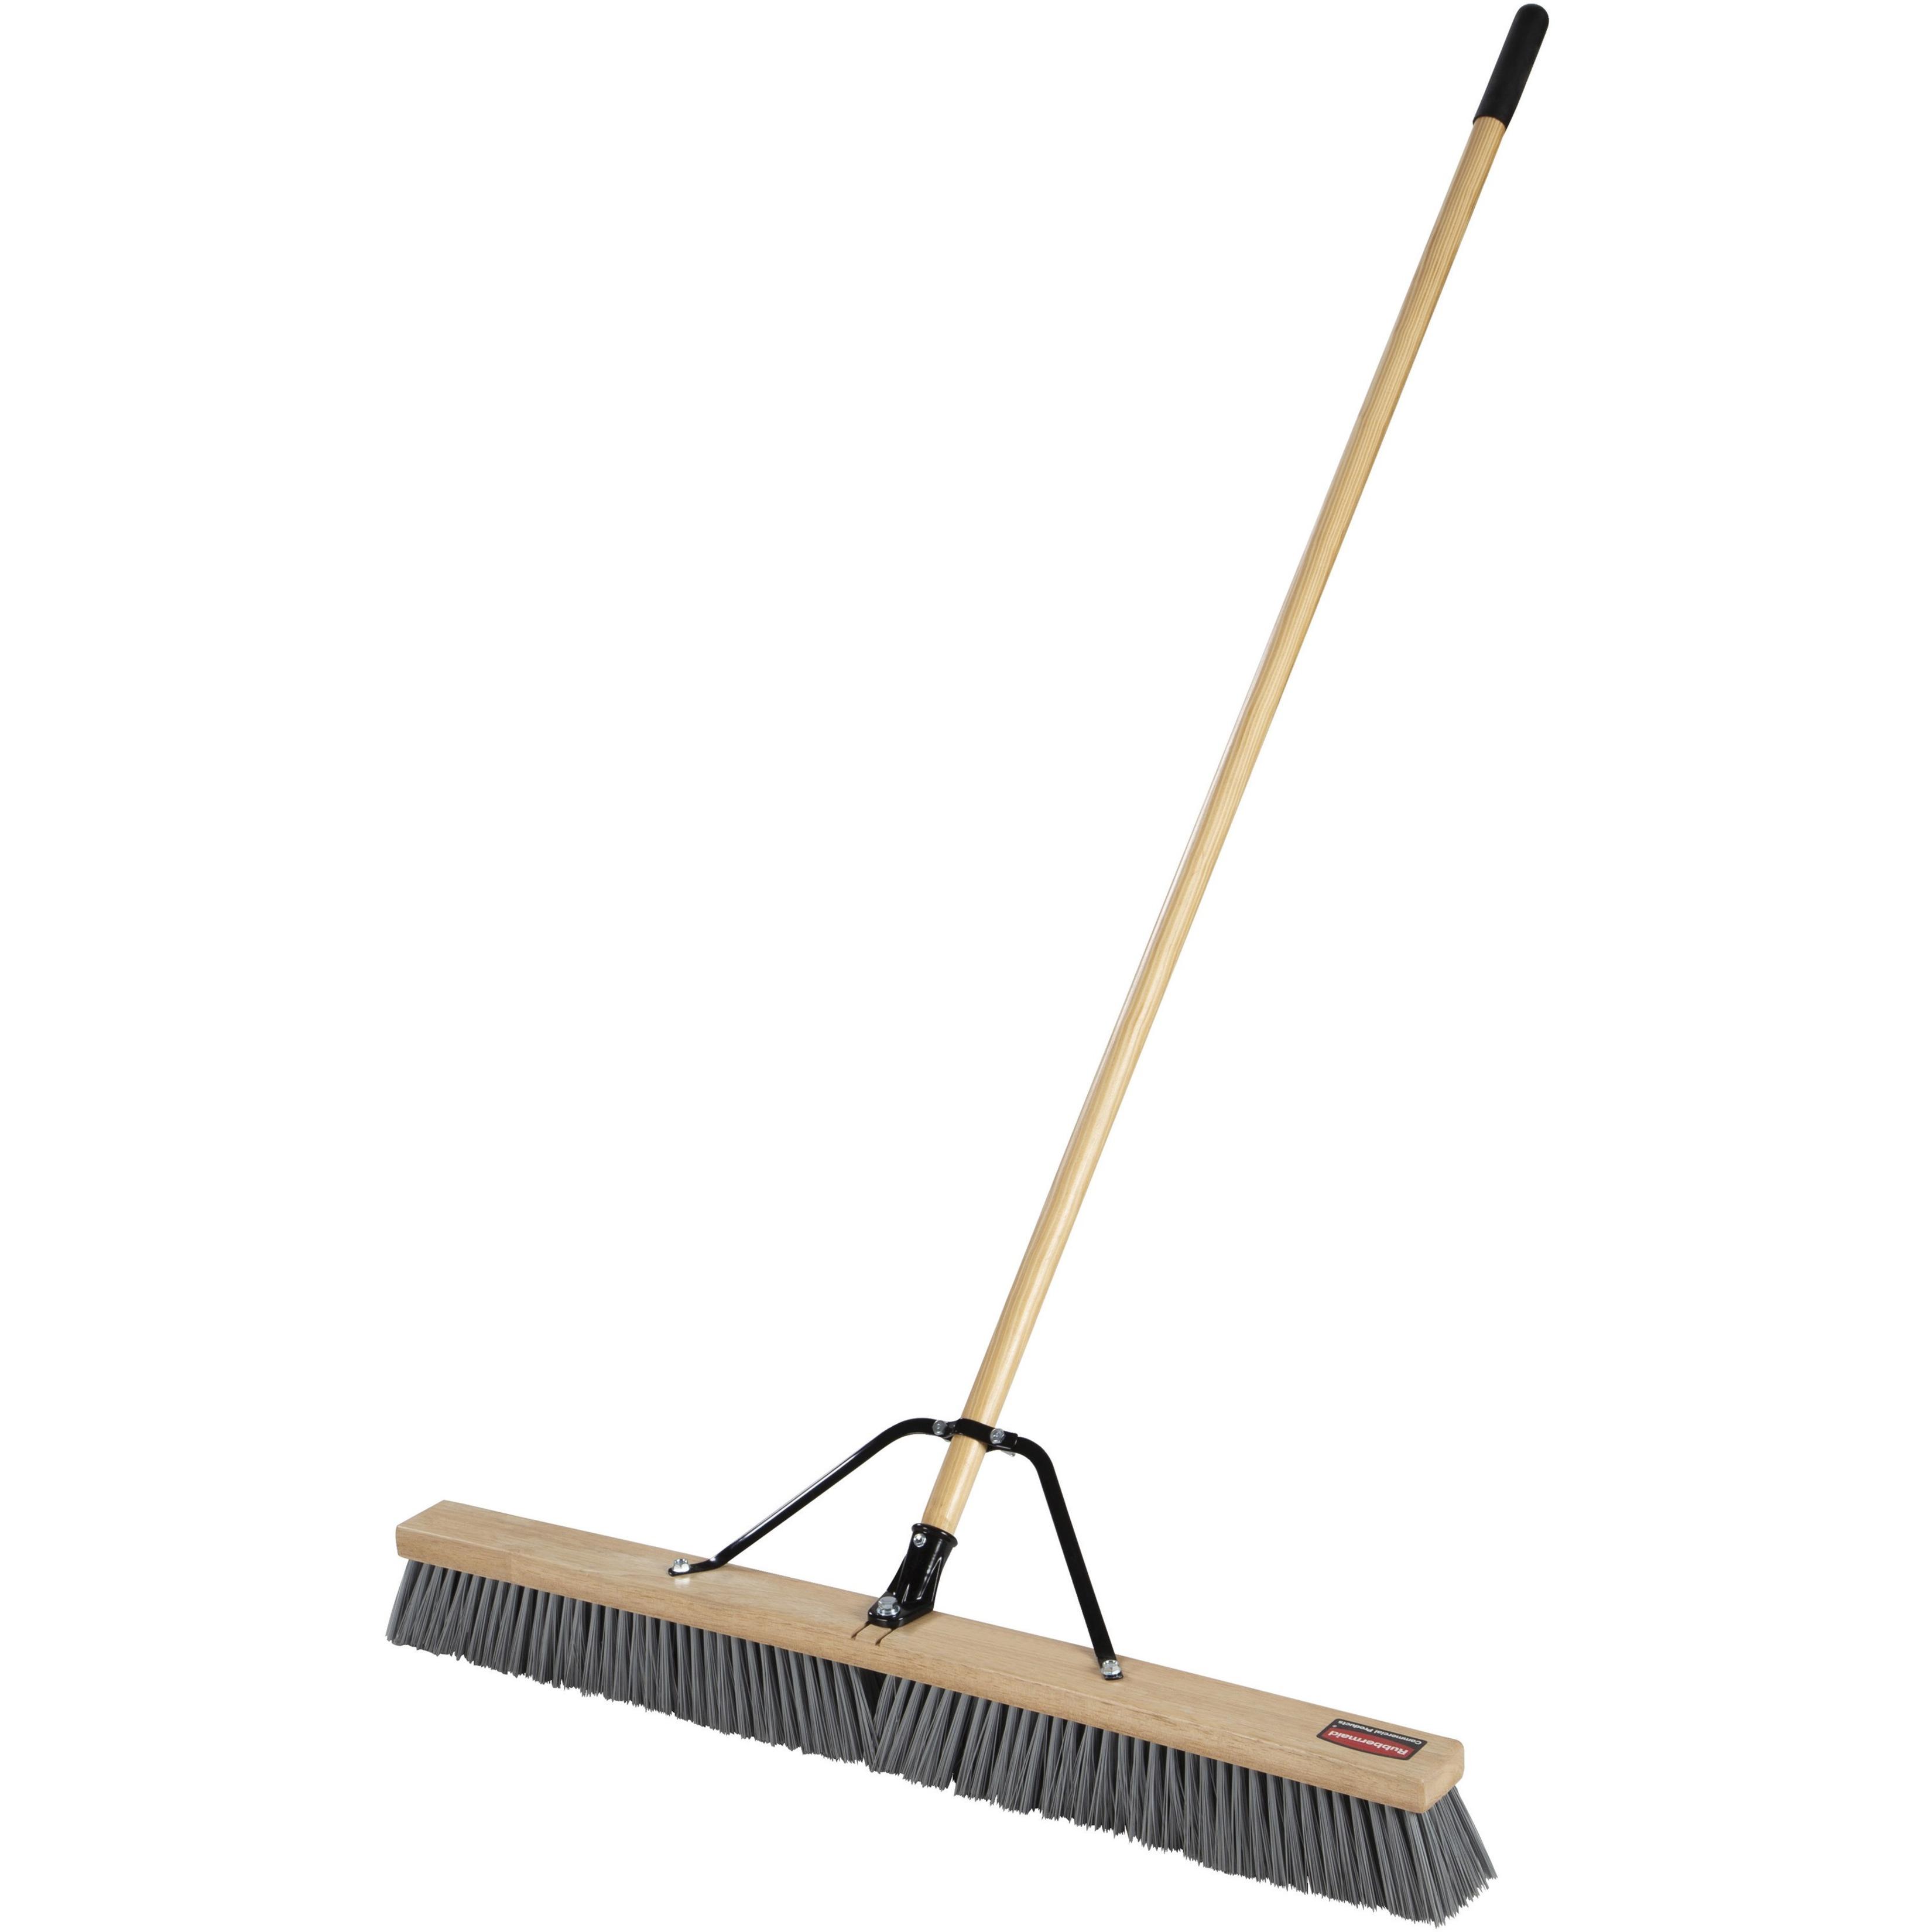 "Push Brooms, 36"" Brush, PP Bristles, For Rough Floor Surfaces, 62"" Wood Handle, Natural"